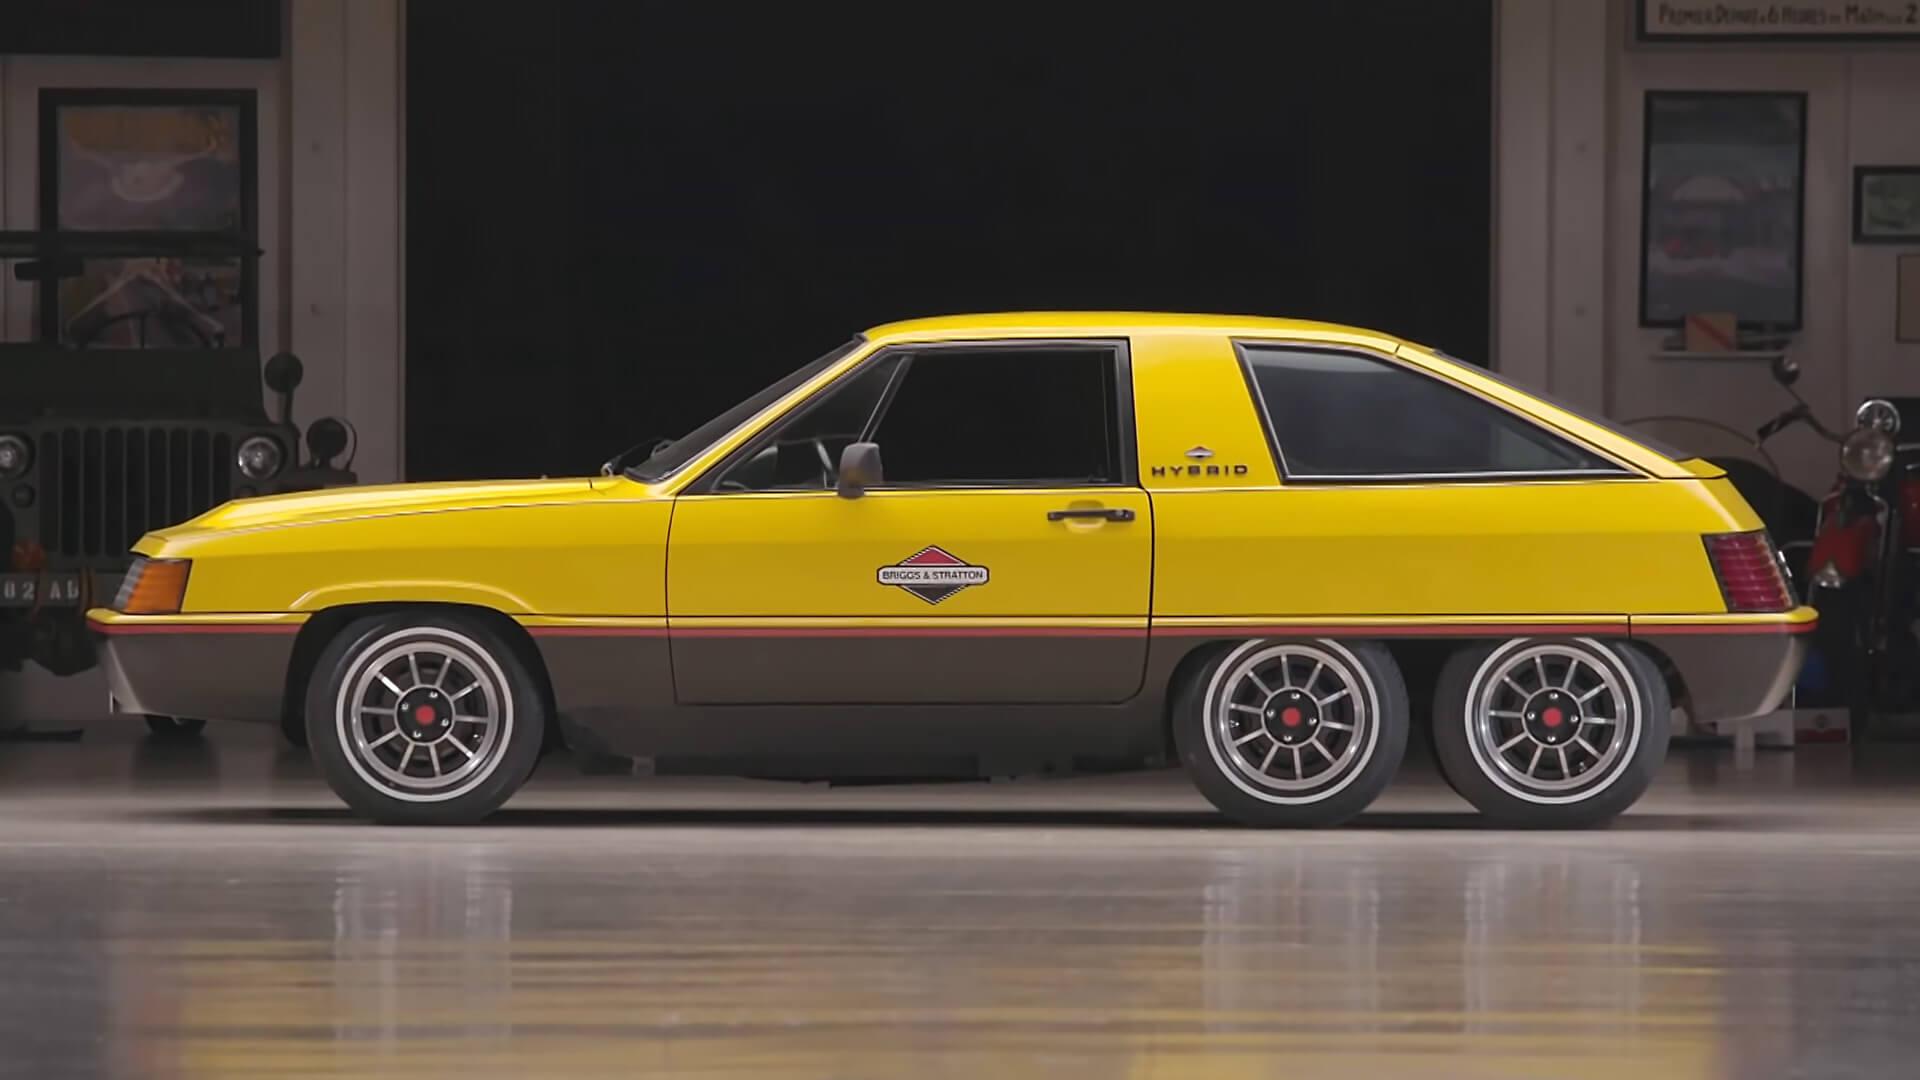 6-колесный концепт Briggs & Stratton Hybrid 1980 года